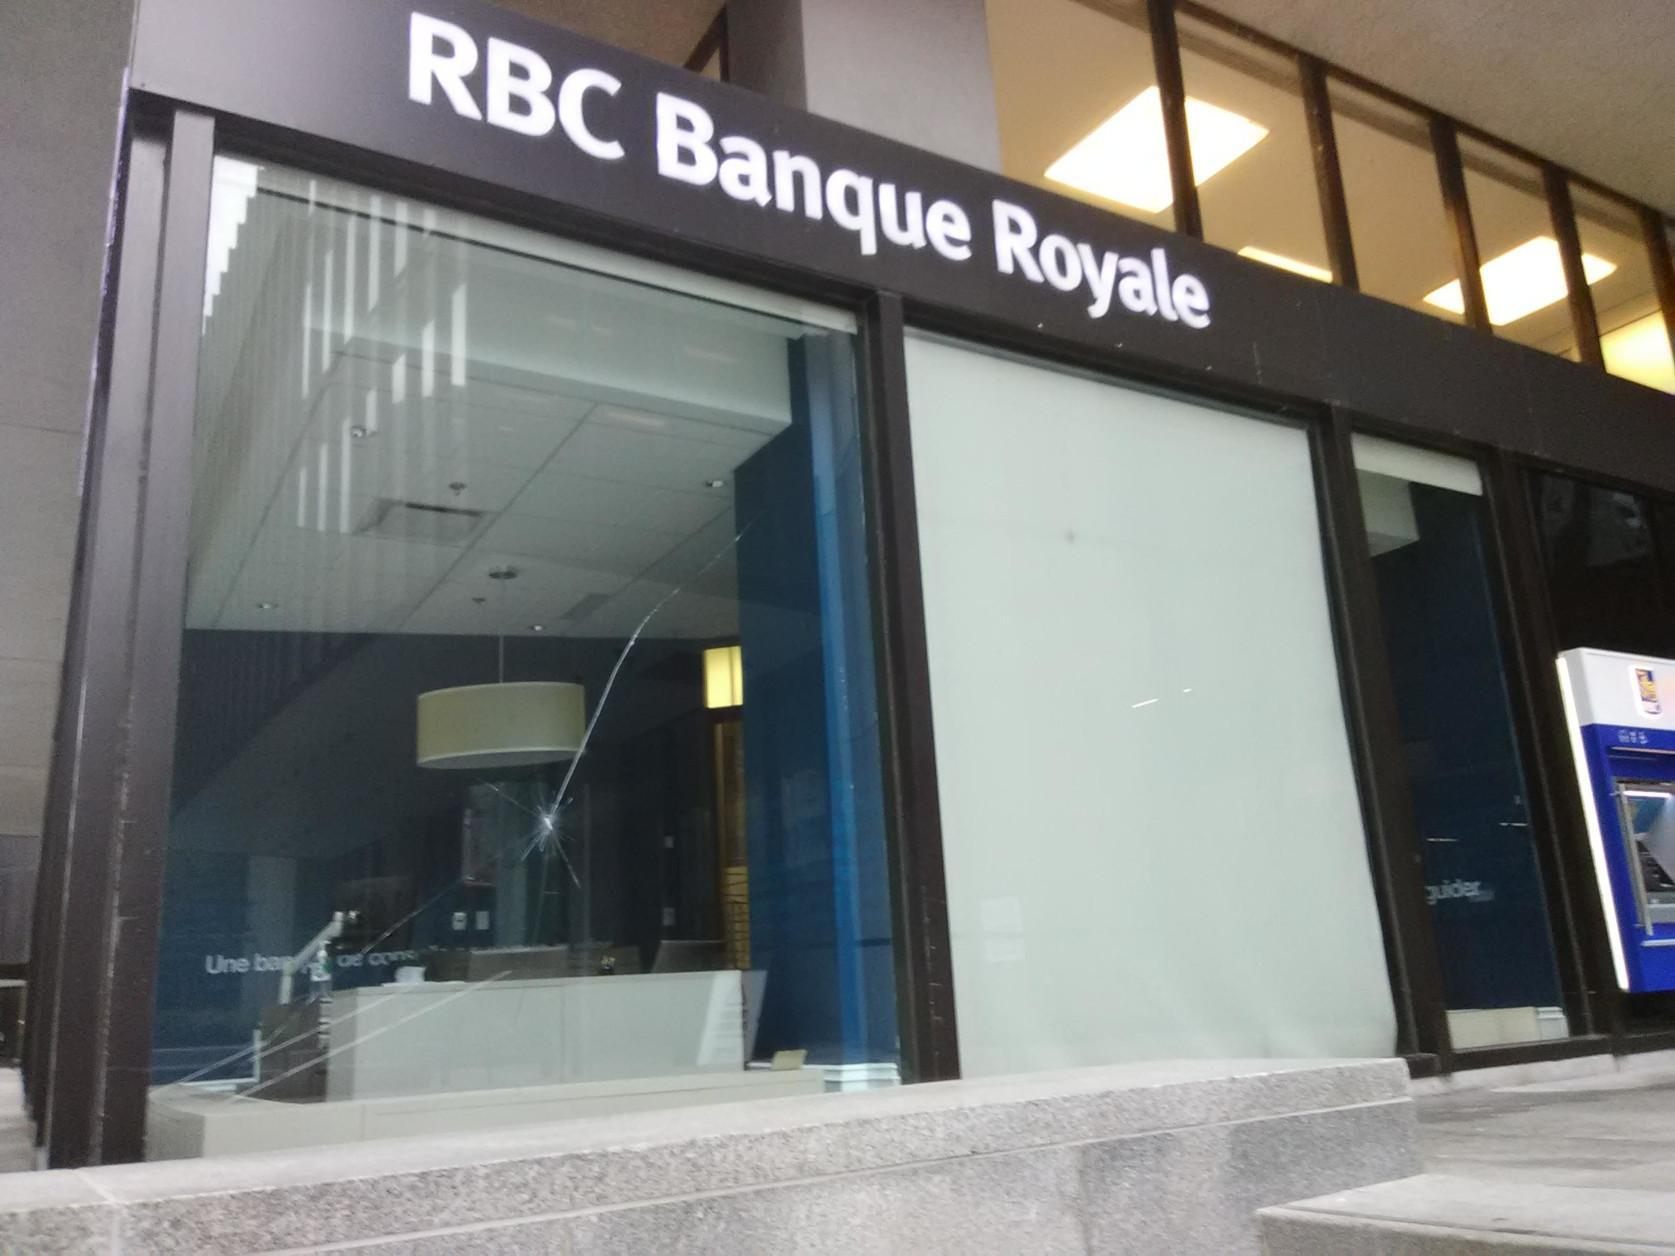 RBC Targeted in Solidarity with Wet'suwet'en Land Defenders